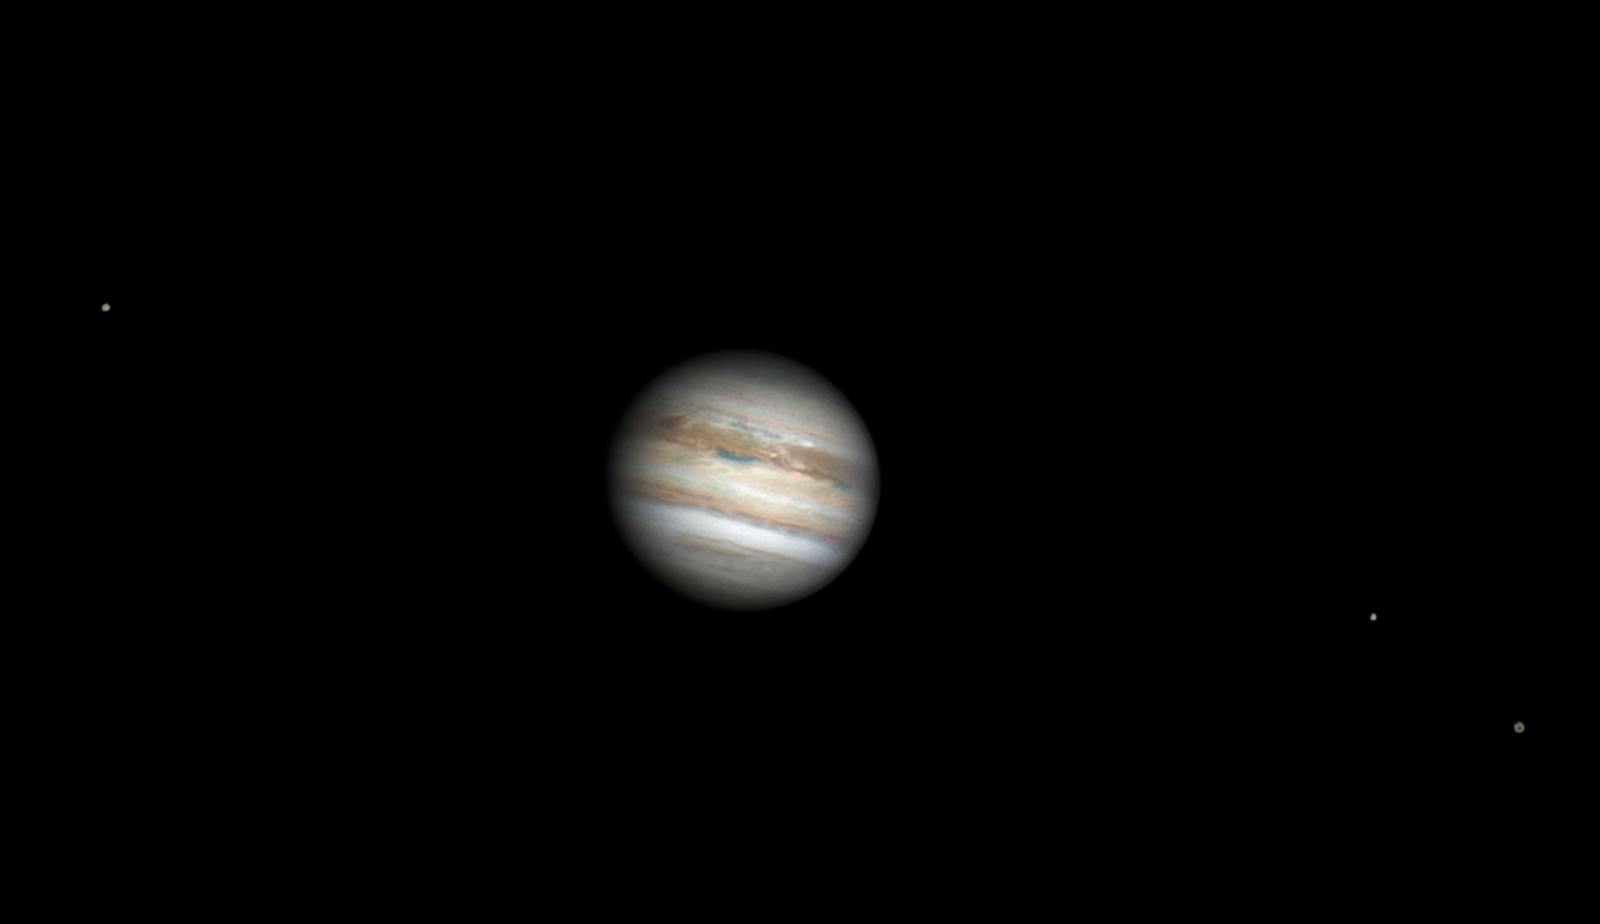 Jupiter_2020-09-15T20_36_39_LRGB.thumb.jpg.d829a1f69c00fdc5fad9898b95670580.jpg